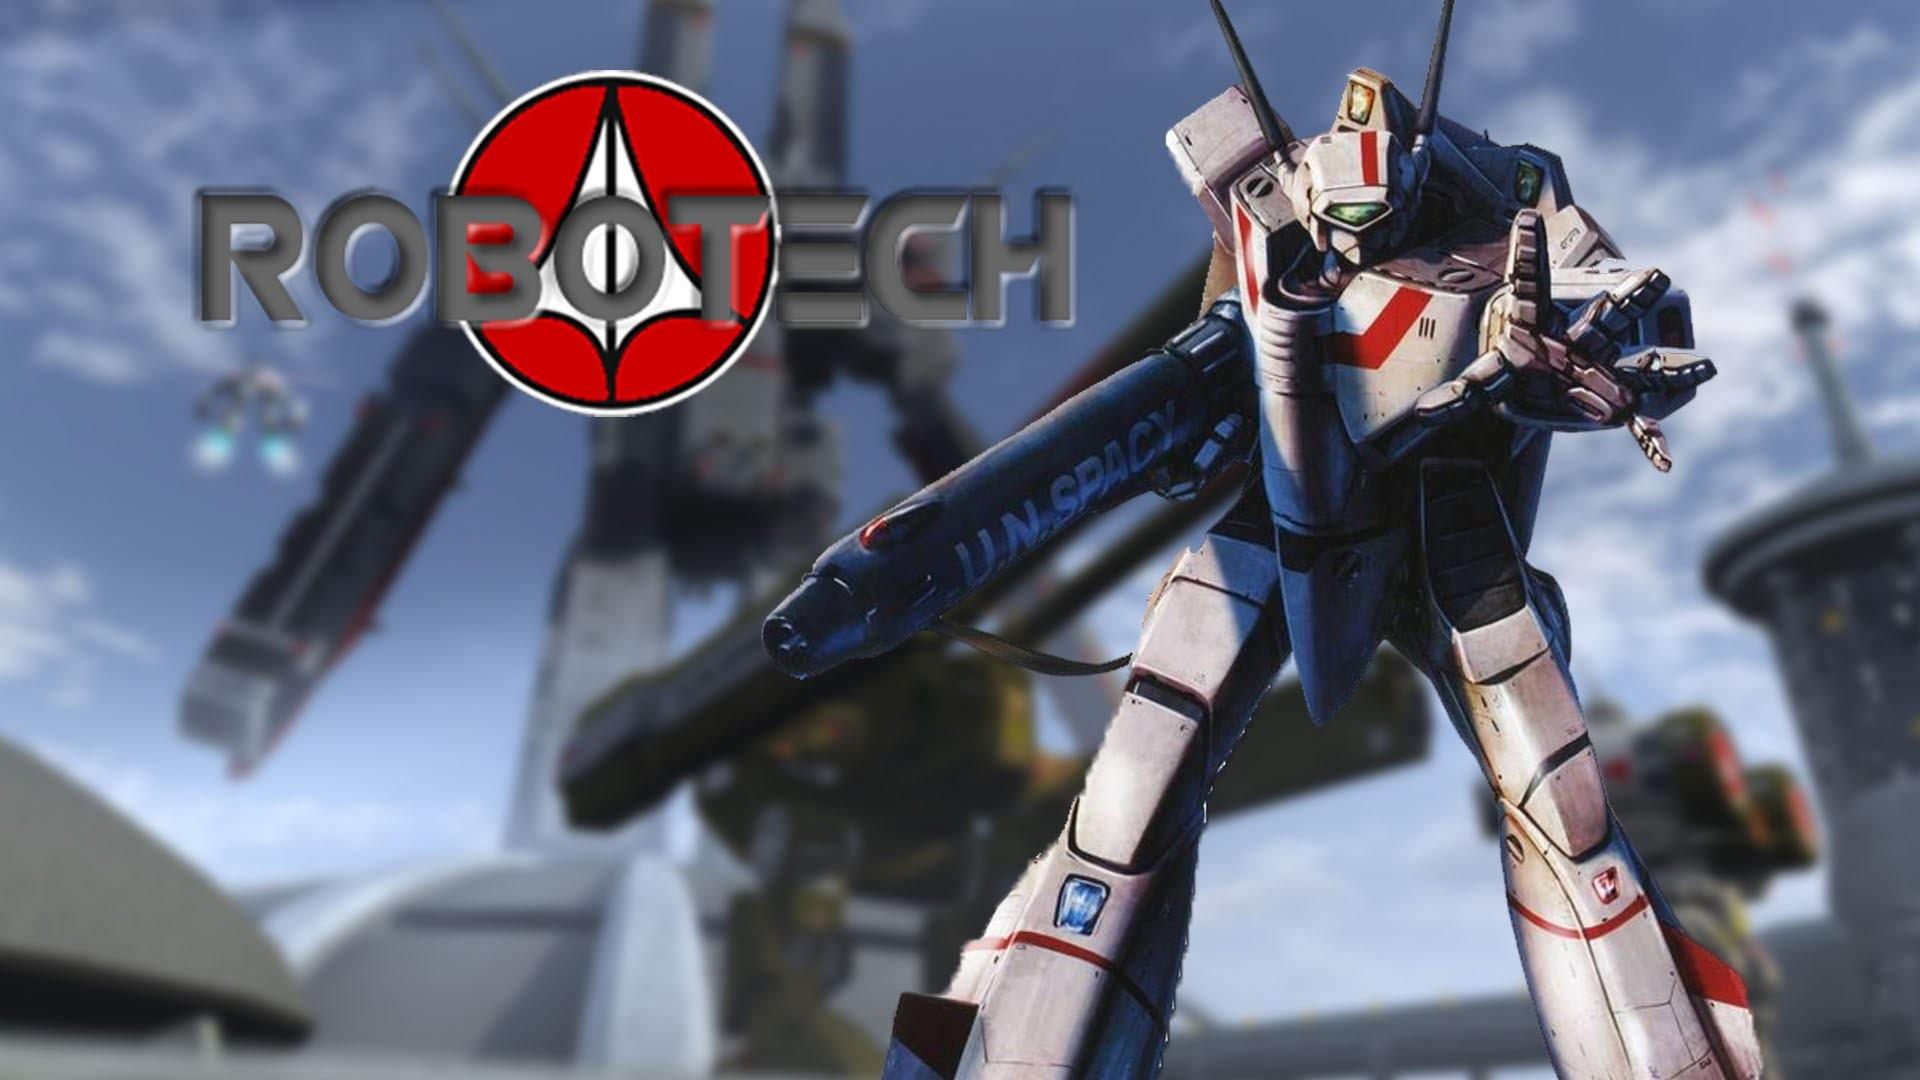 Robotech wallpaper wallpapertag - Robotech 1080p ...